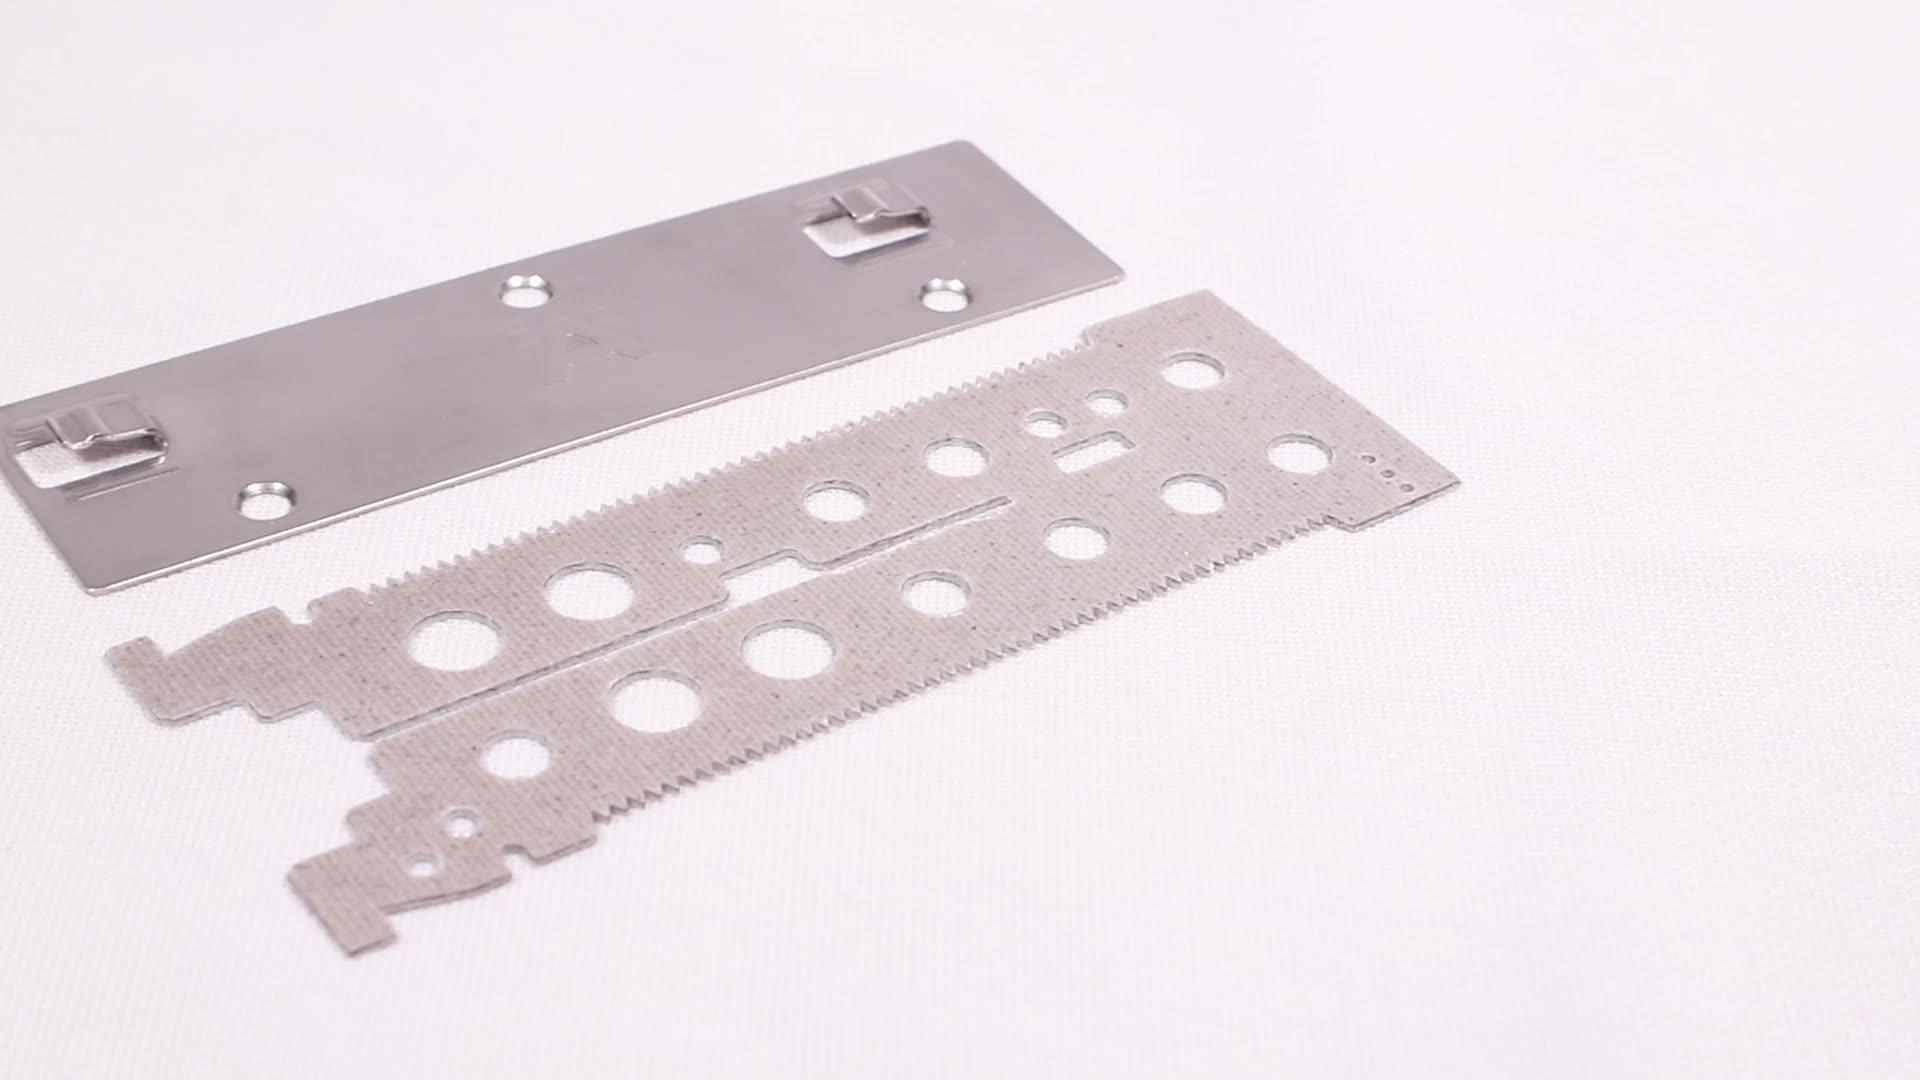 Custom OEM die stamping mould factory dies parts mold press moulds steel mold manufacturer